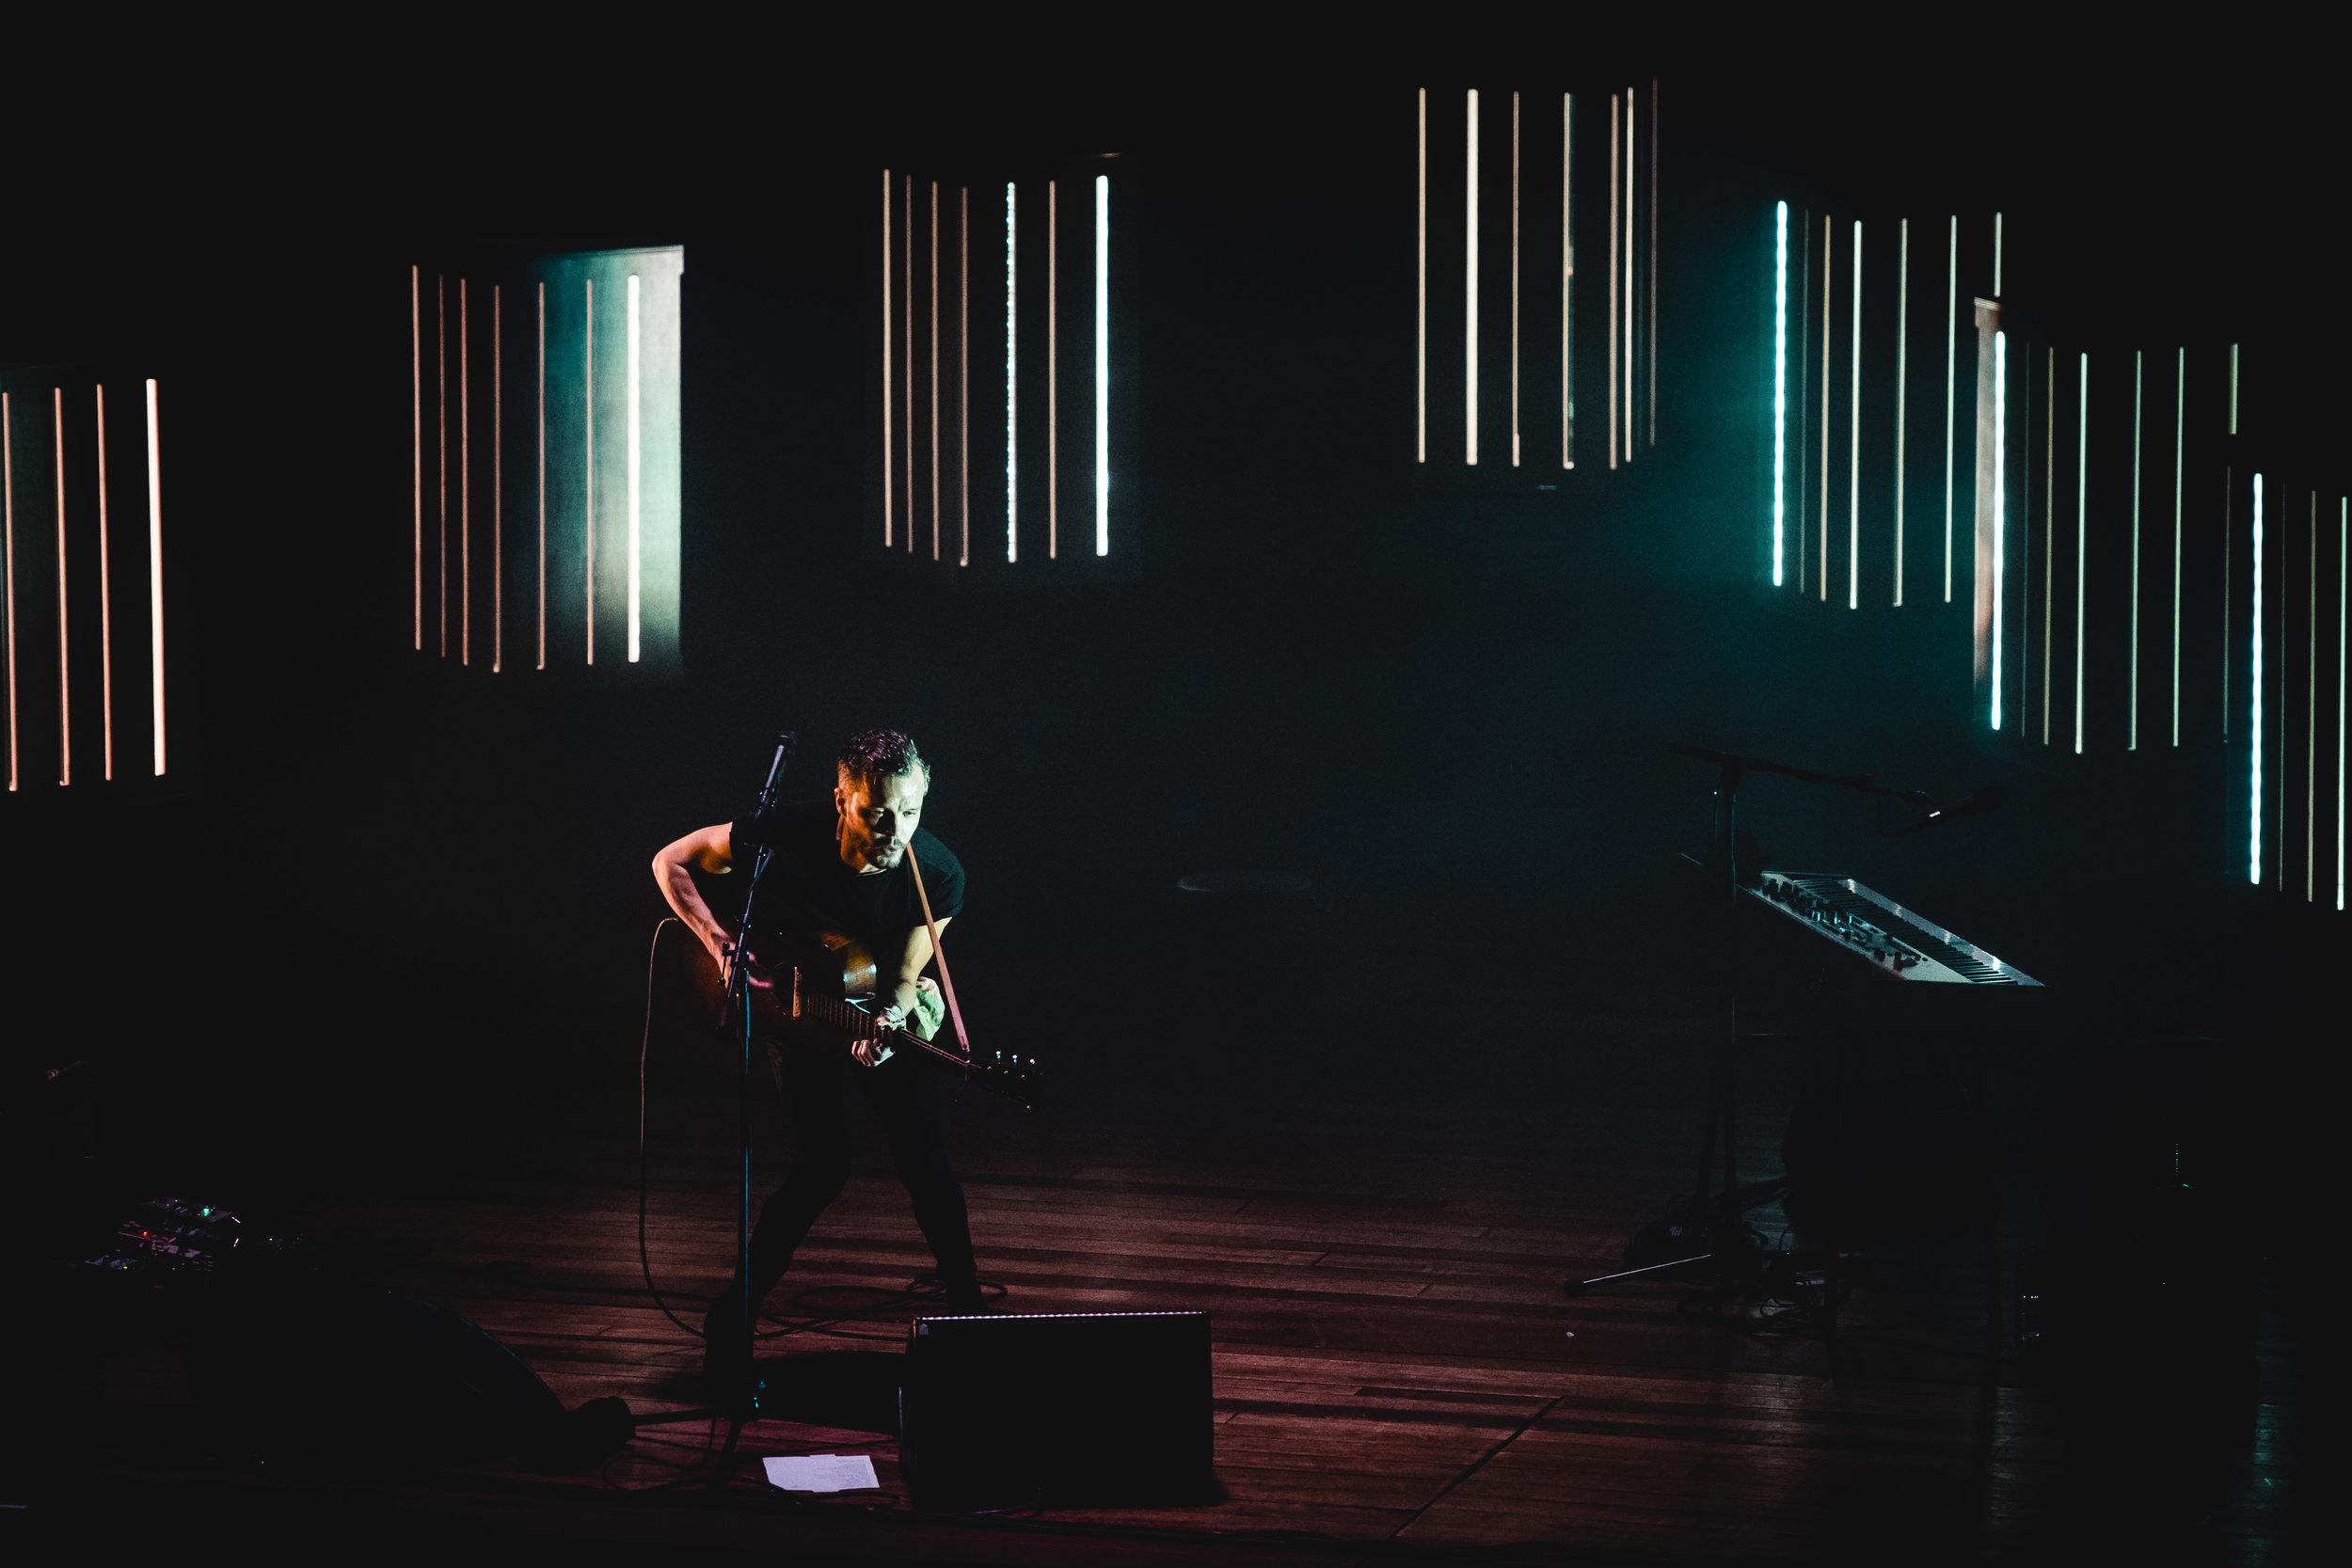 2018-09-27 - De Roma - The Tallest Man on Earth - 02 concert - 014.jpg